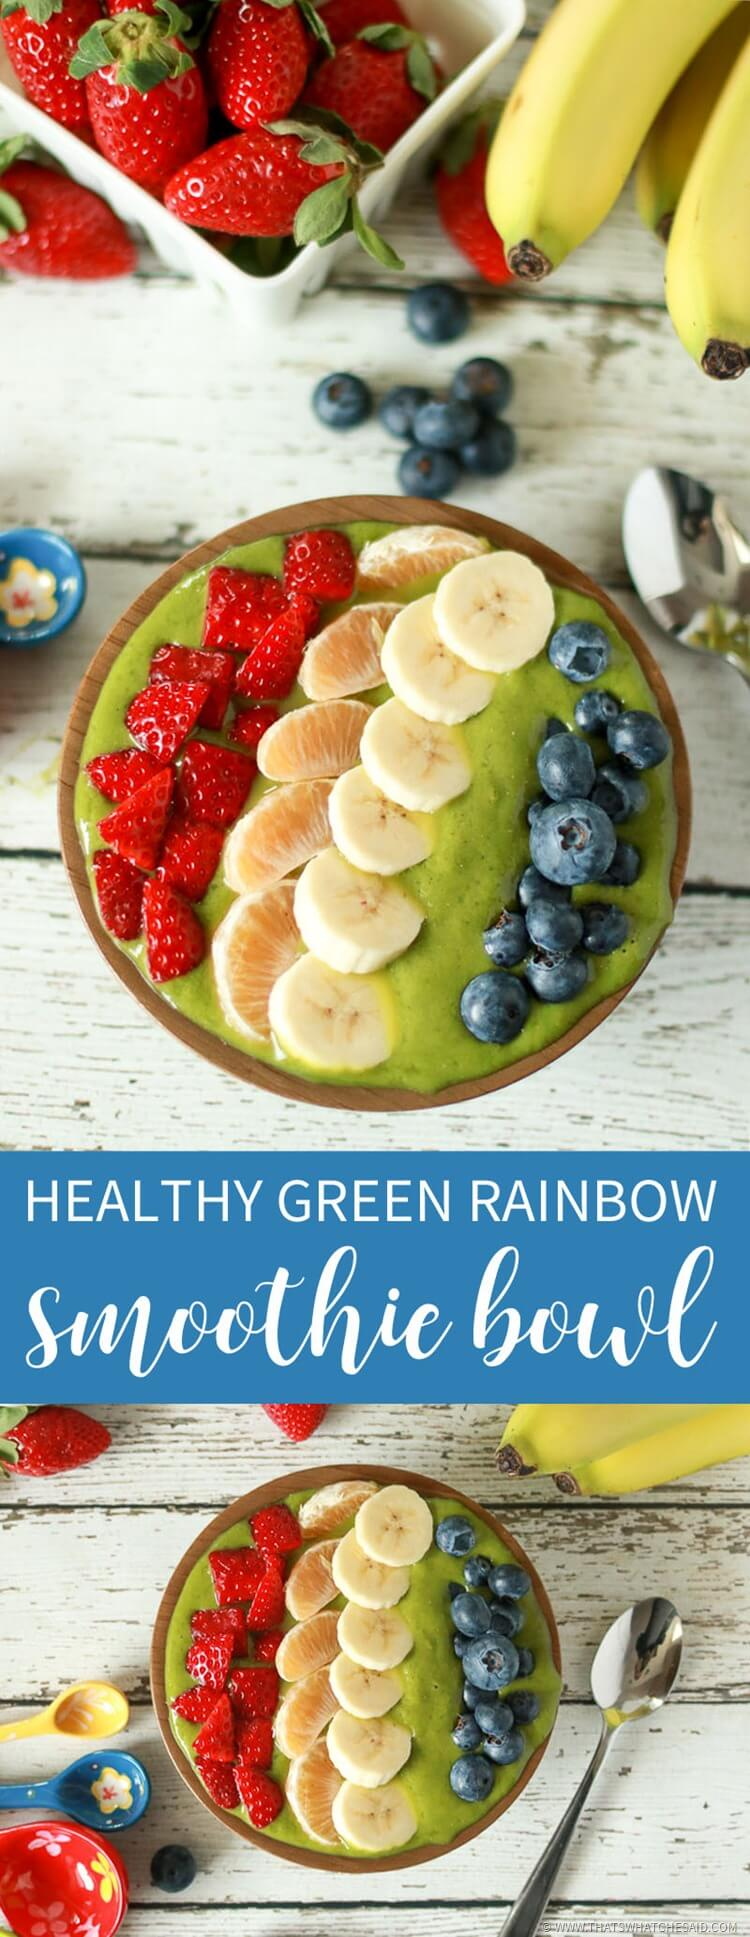 Healthy Rainbow Green Smoothie Bowl